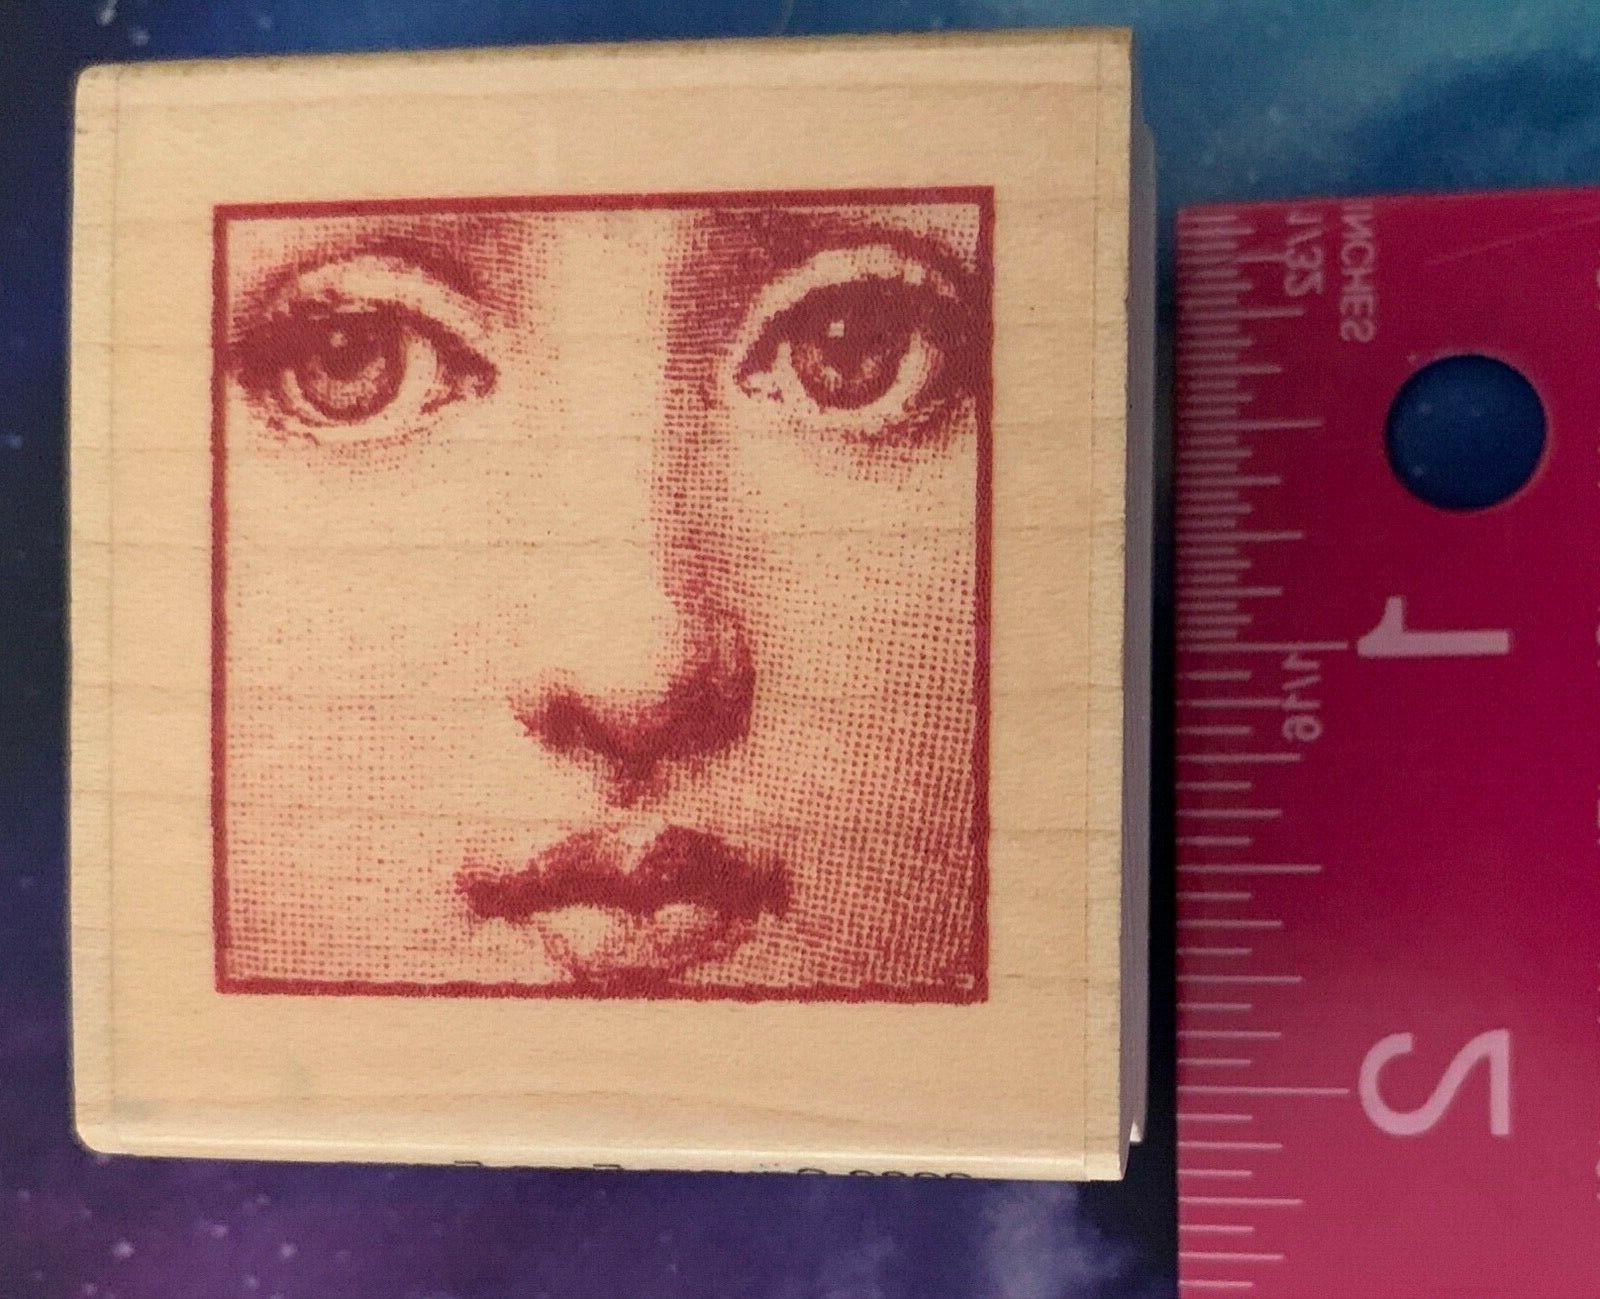 WOMAN'S Fornasetti: Lina Cavalieri, Lady